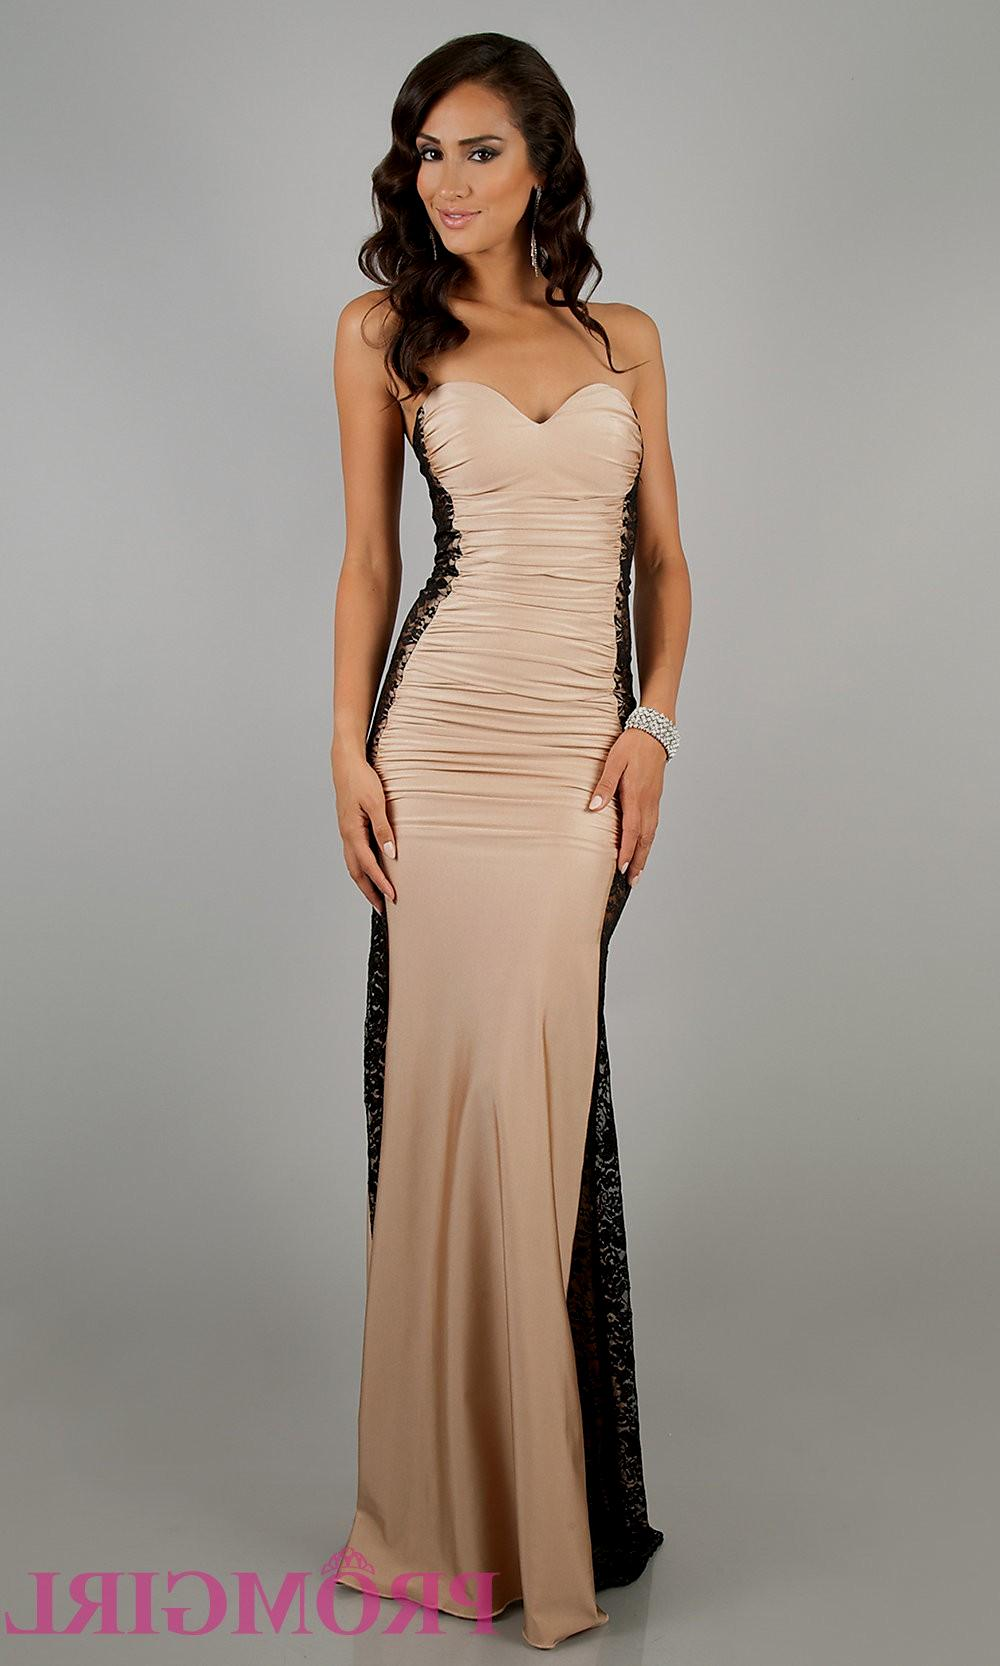 beige evening dresses photo - 1